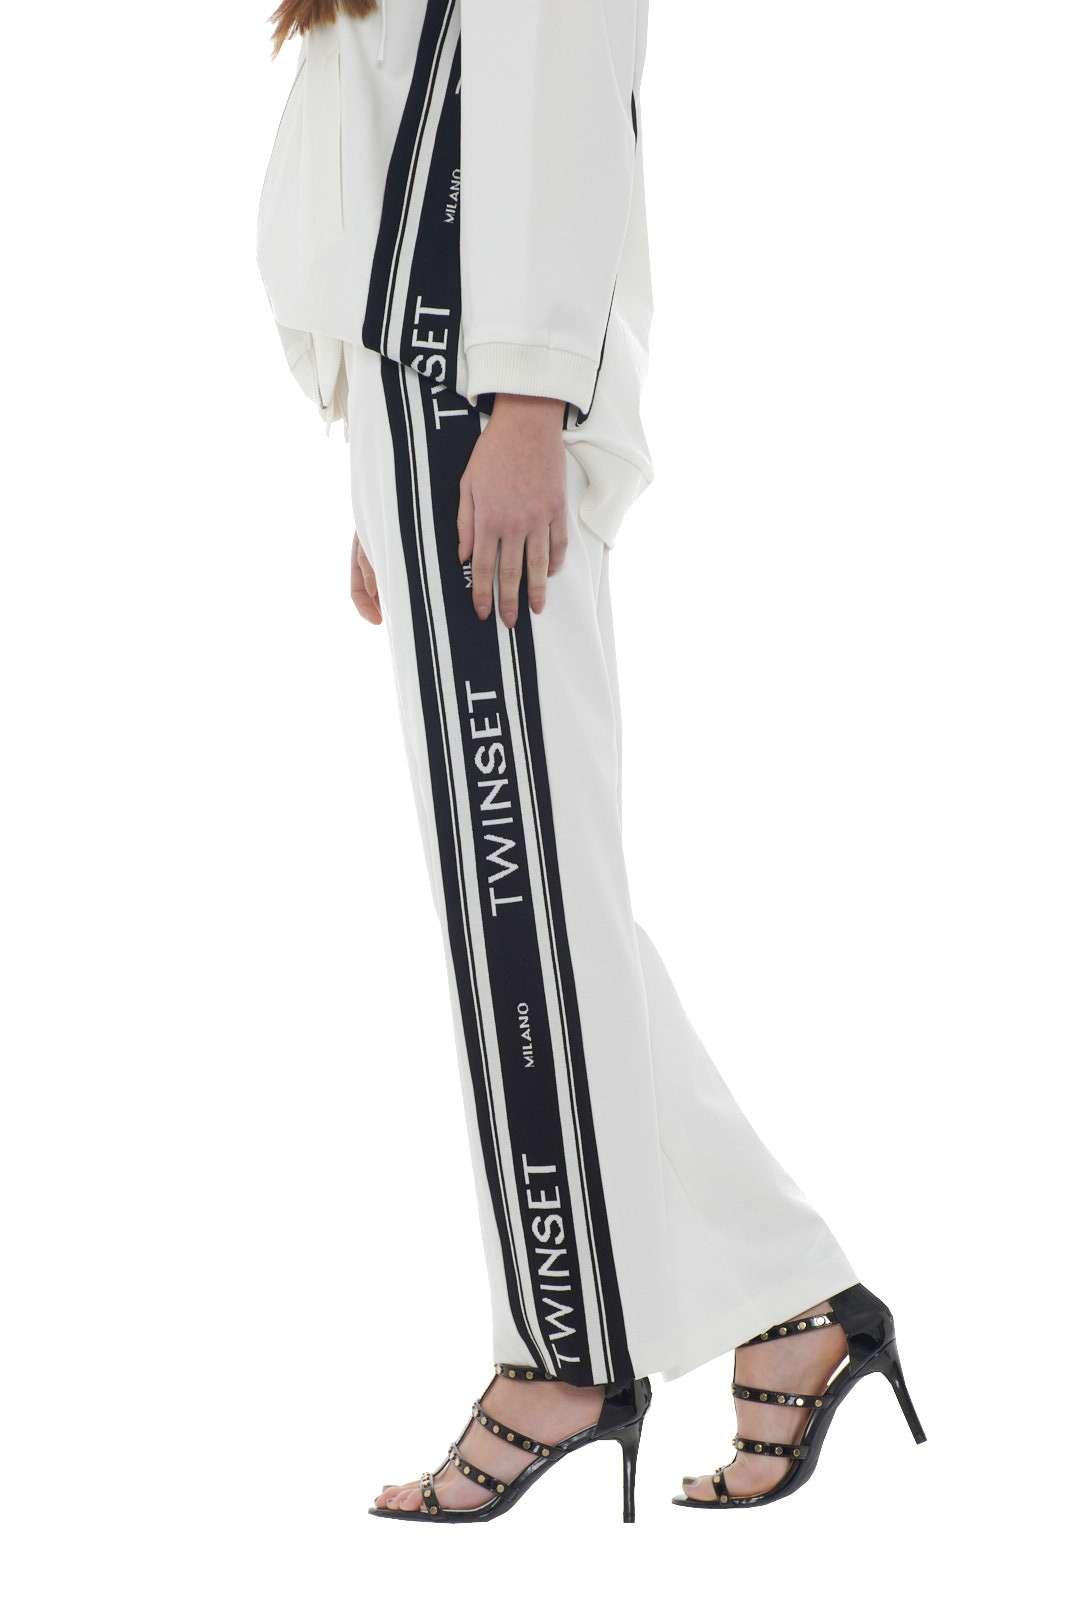 https://www.parmax.com/media/catalog/product/a/i/PE-outlet_parmax-pantaloni-donna-TwinSet-201TP2072-B.jpg